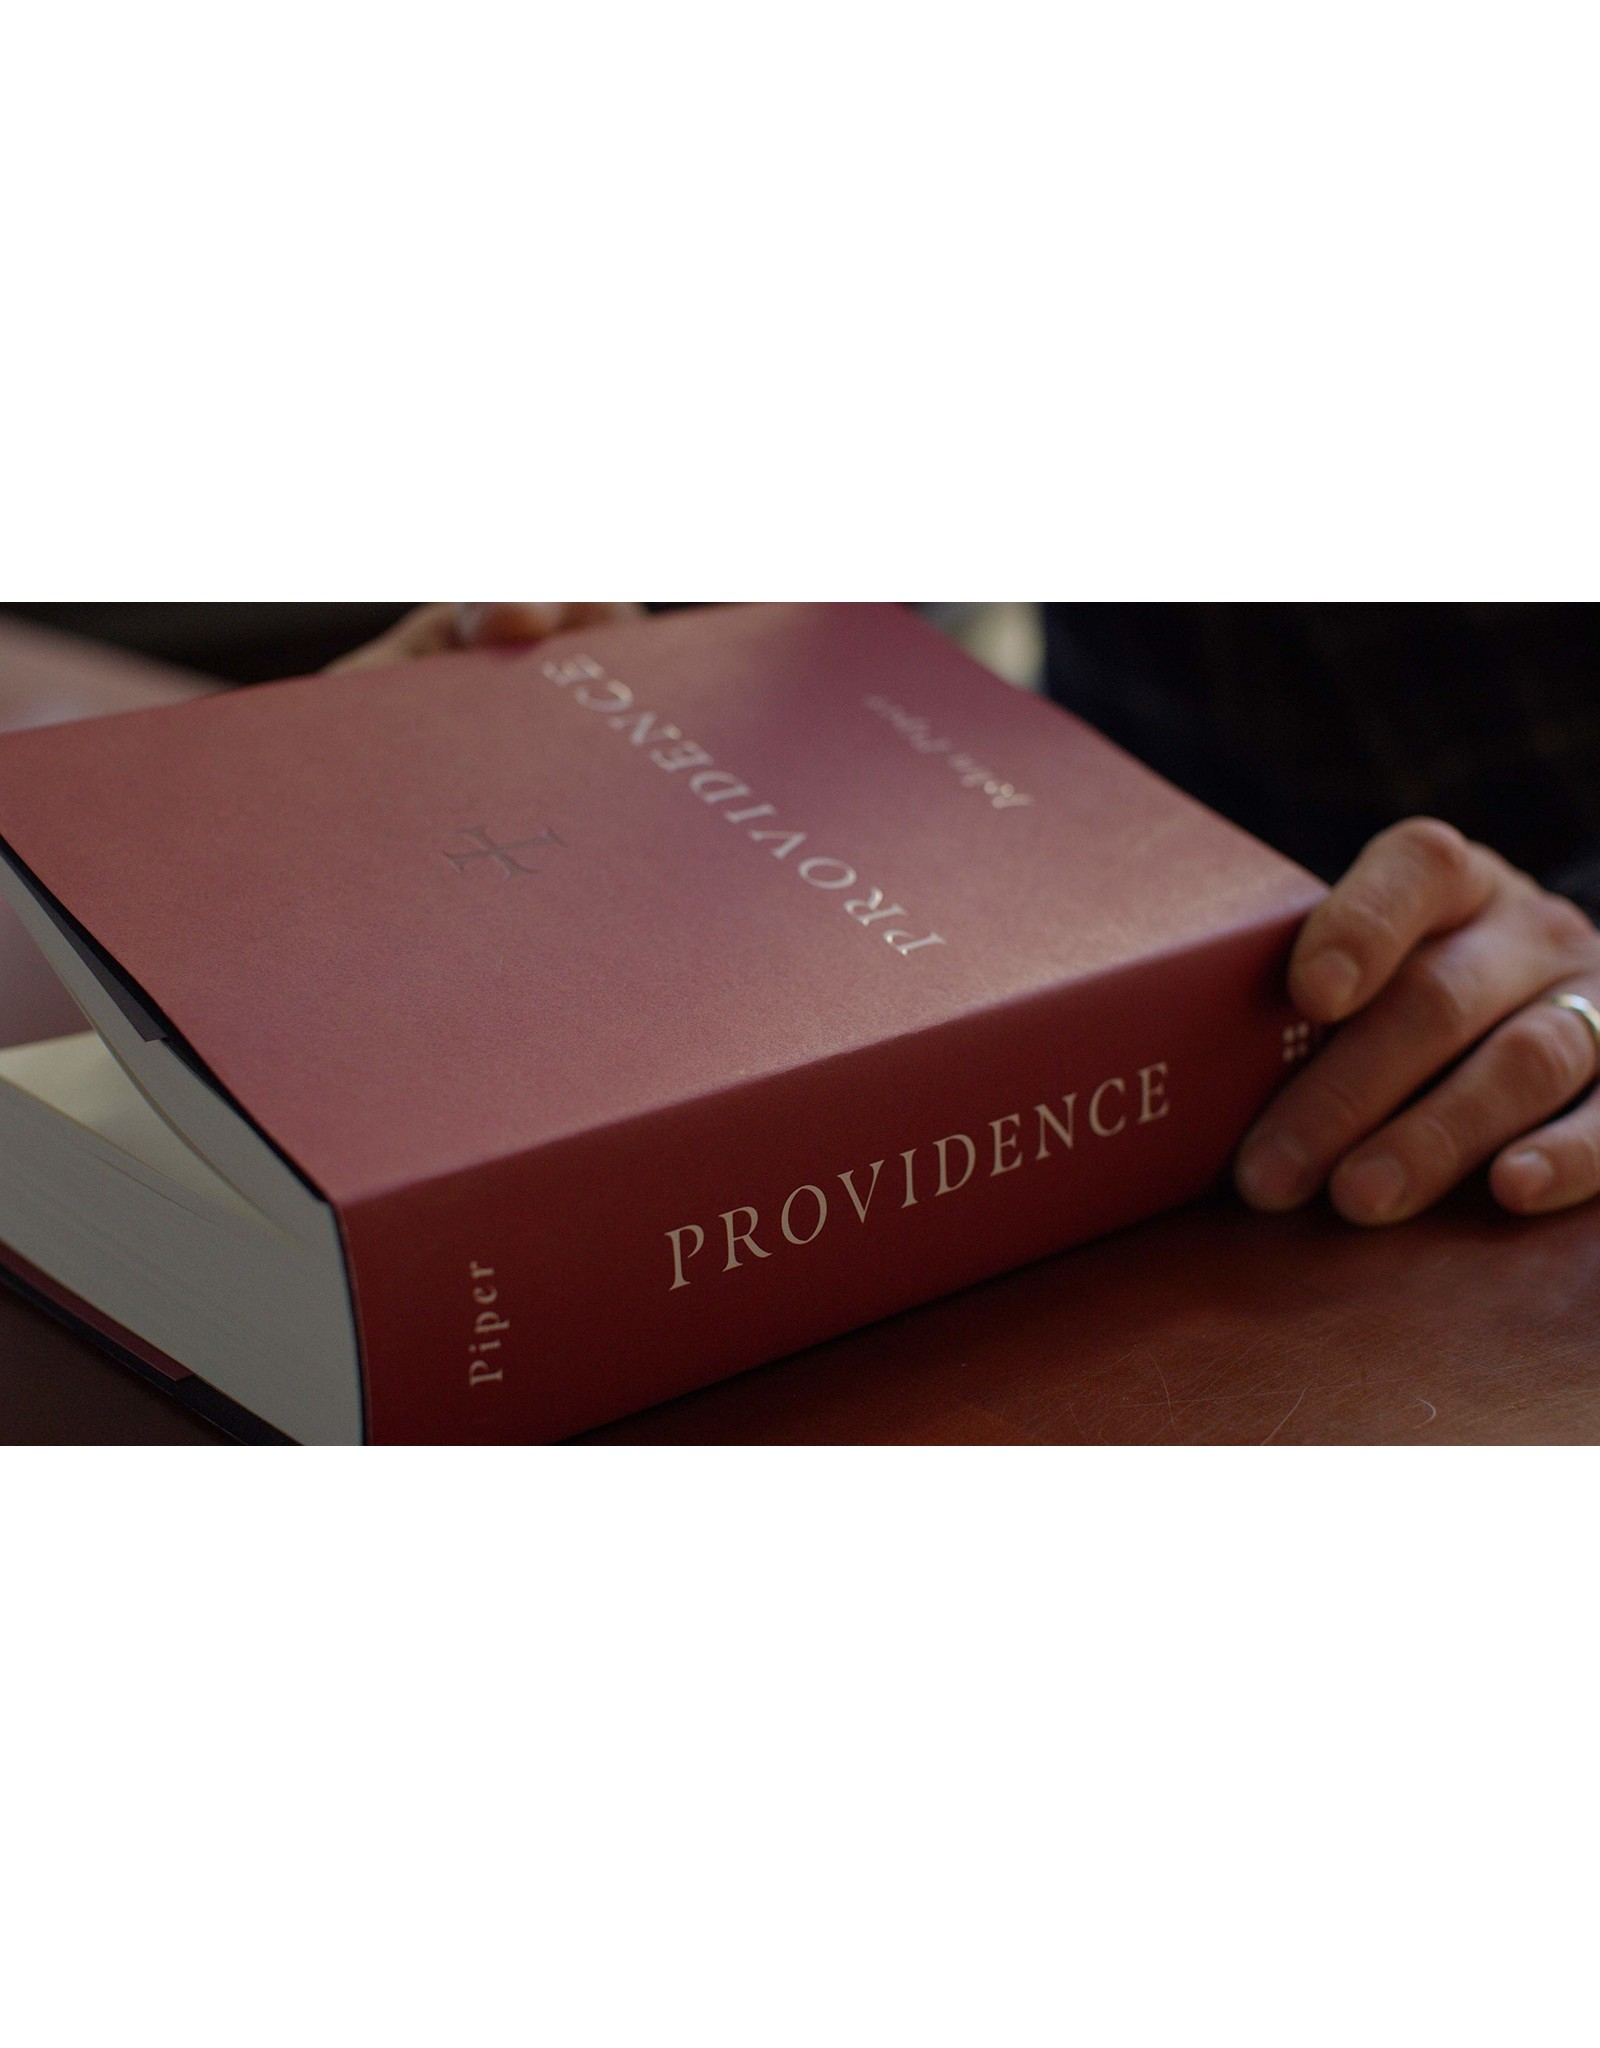 Crossway / Good News Providence by John Piper